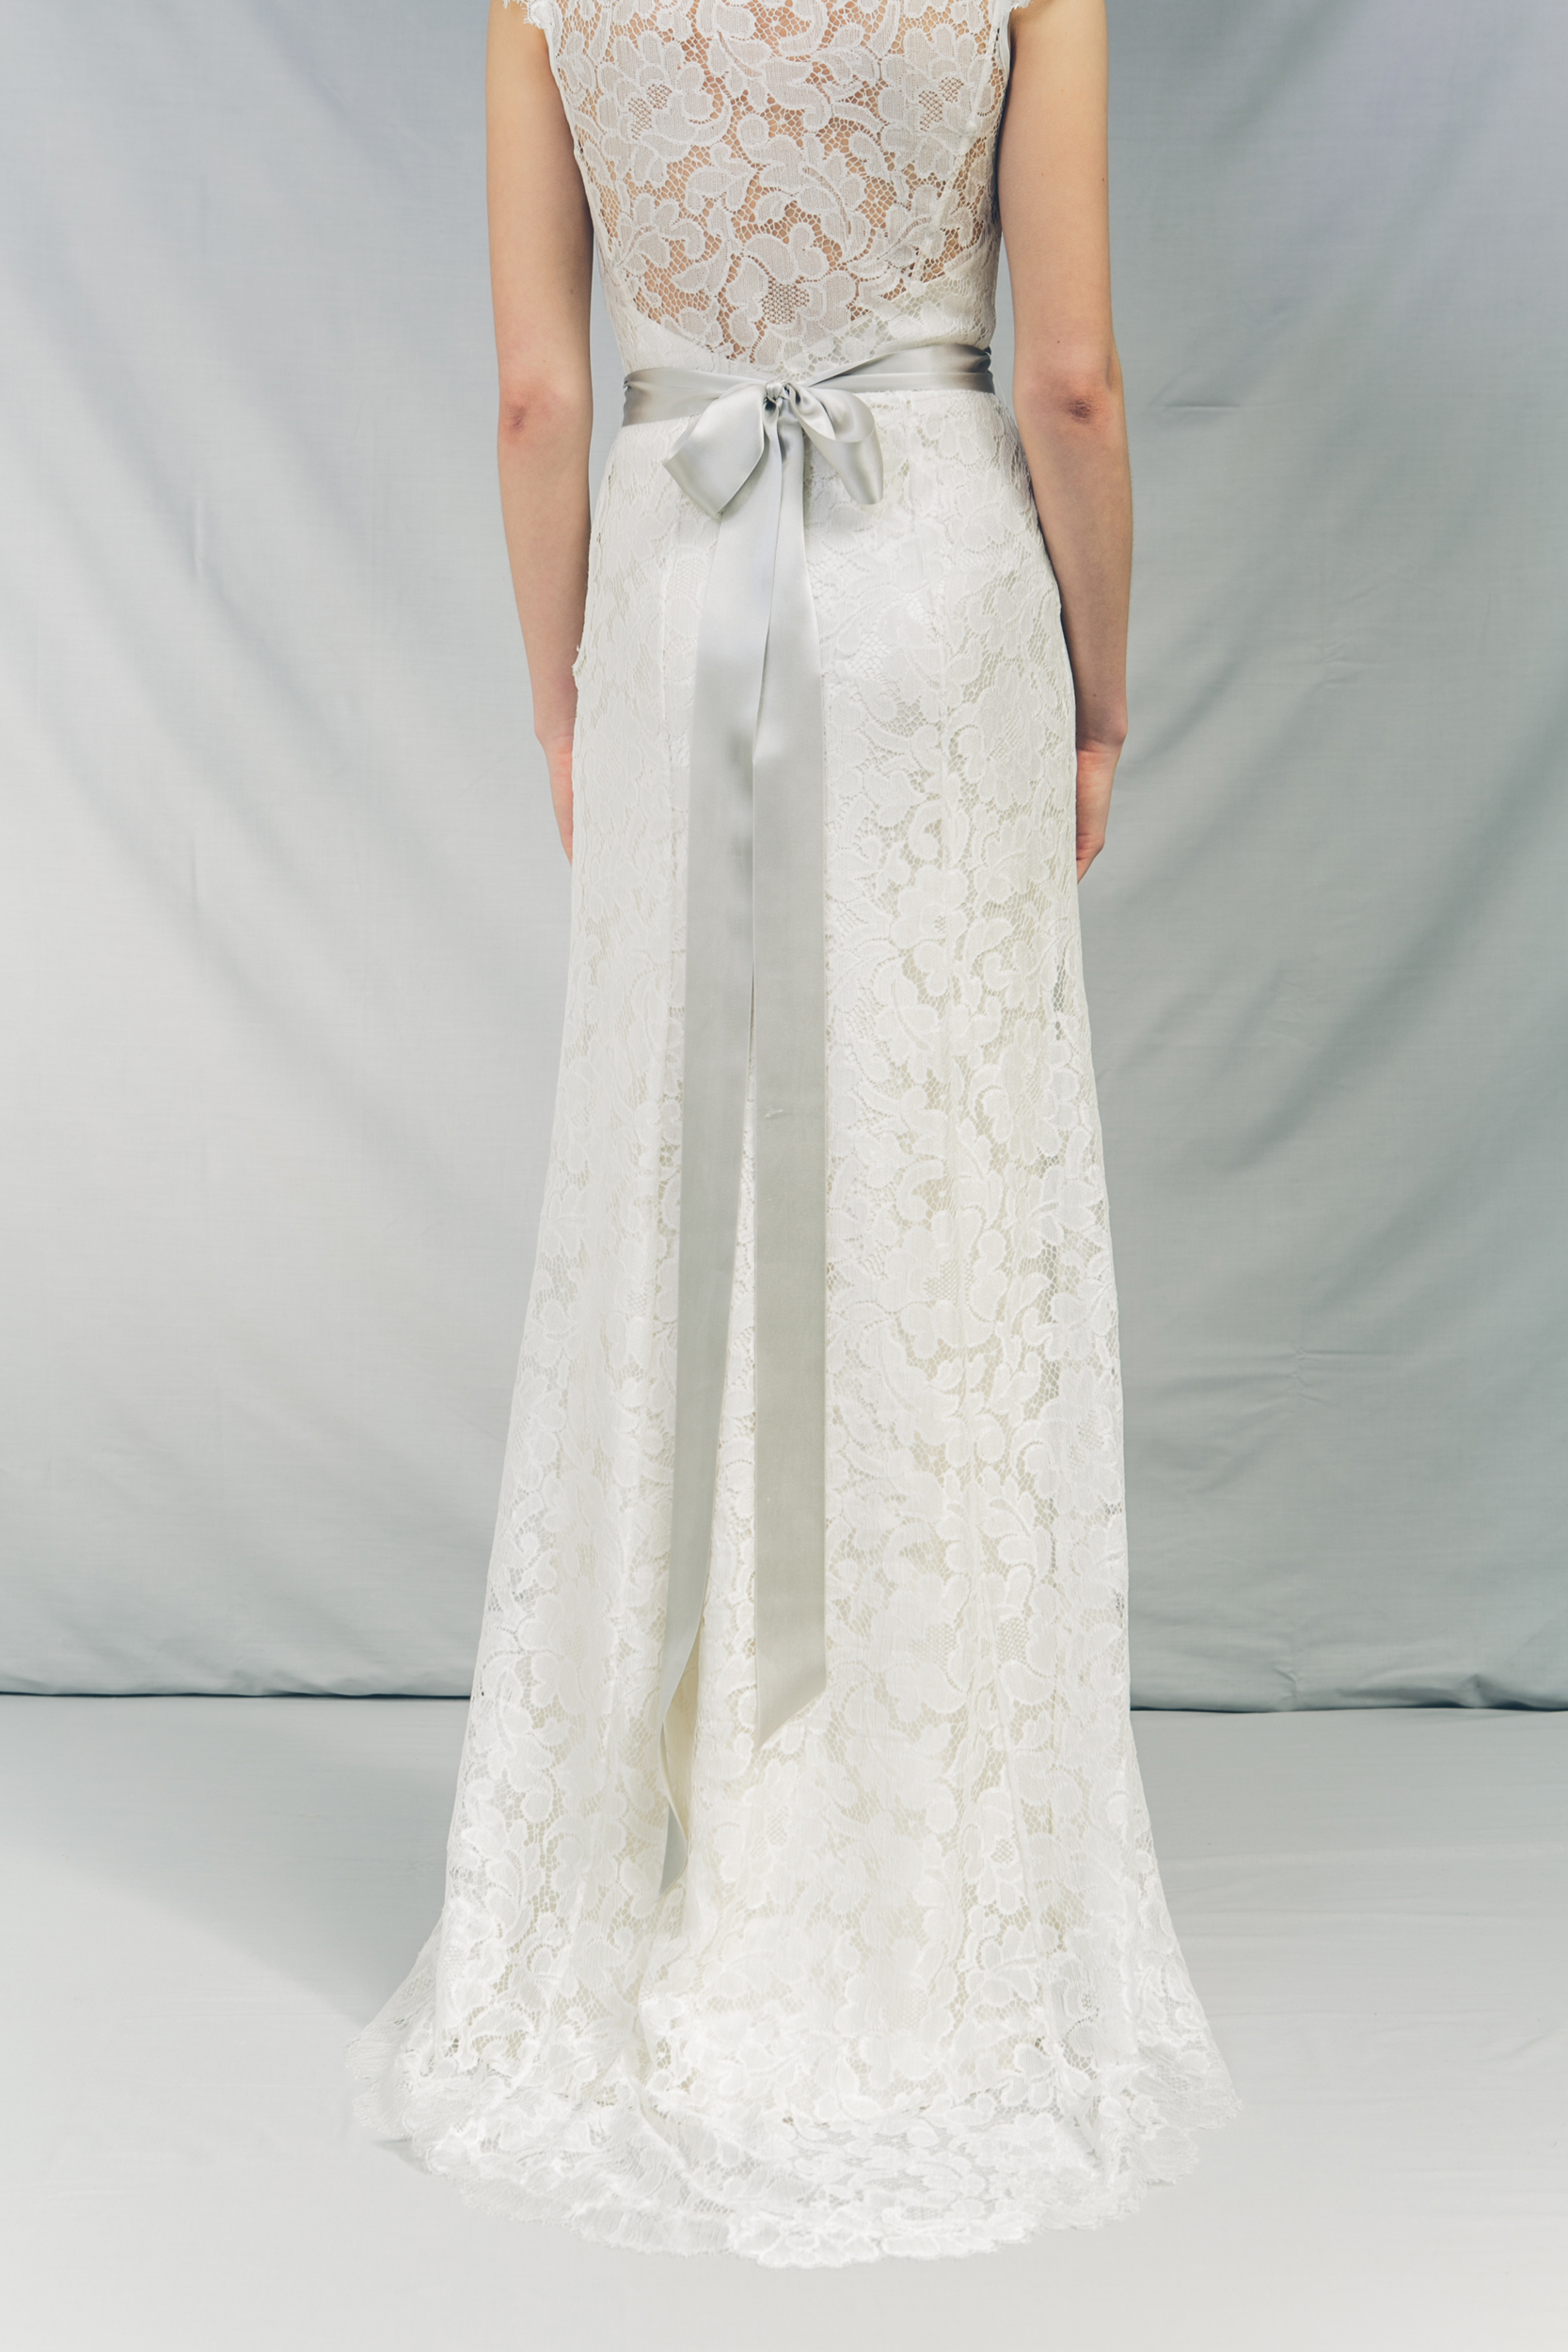 Kate-Beaumont-Wedding-Dresses-Sheffield-49.jpg